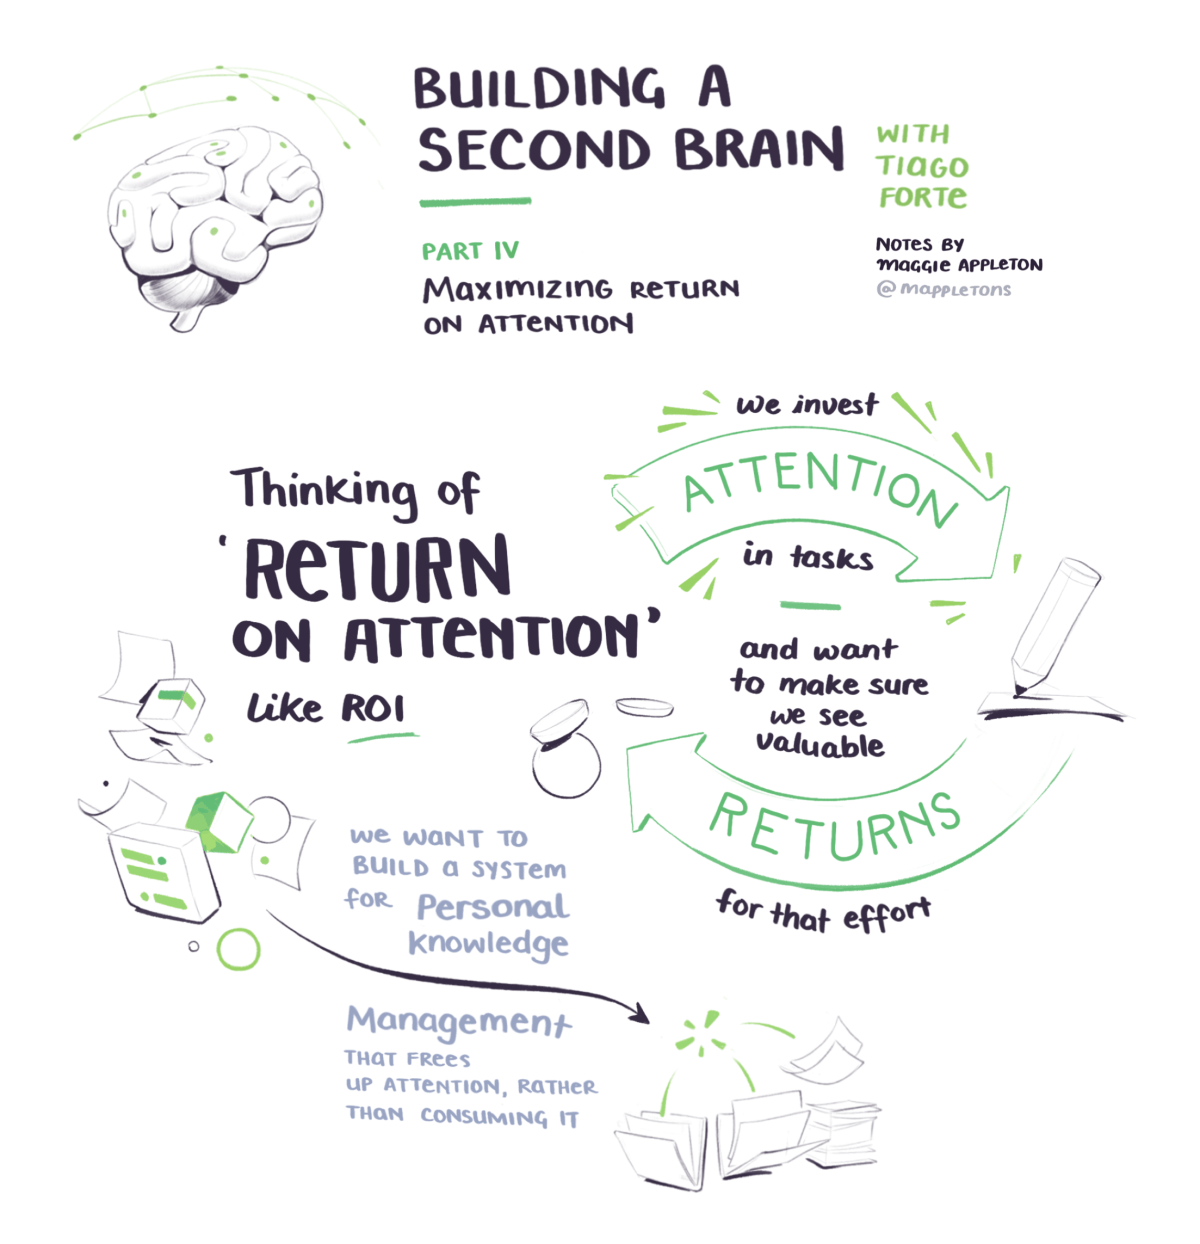 BASB sketchnotes on thinking of return on attention like ROI